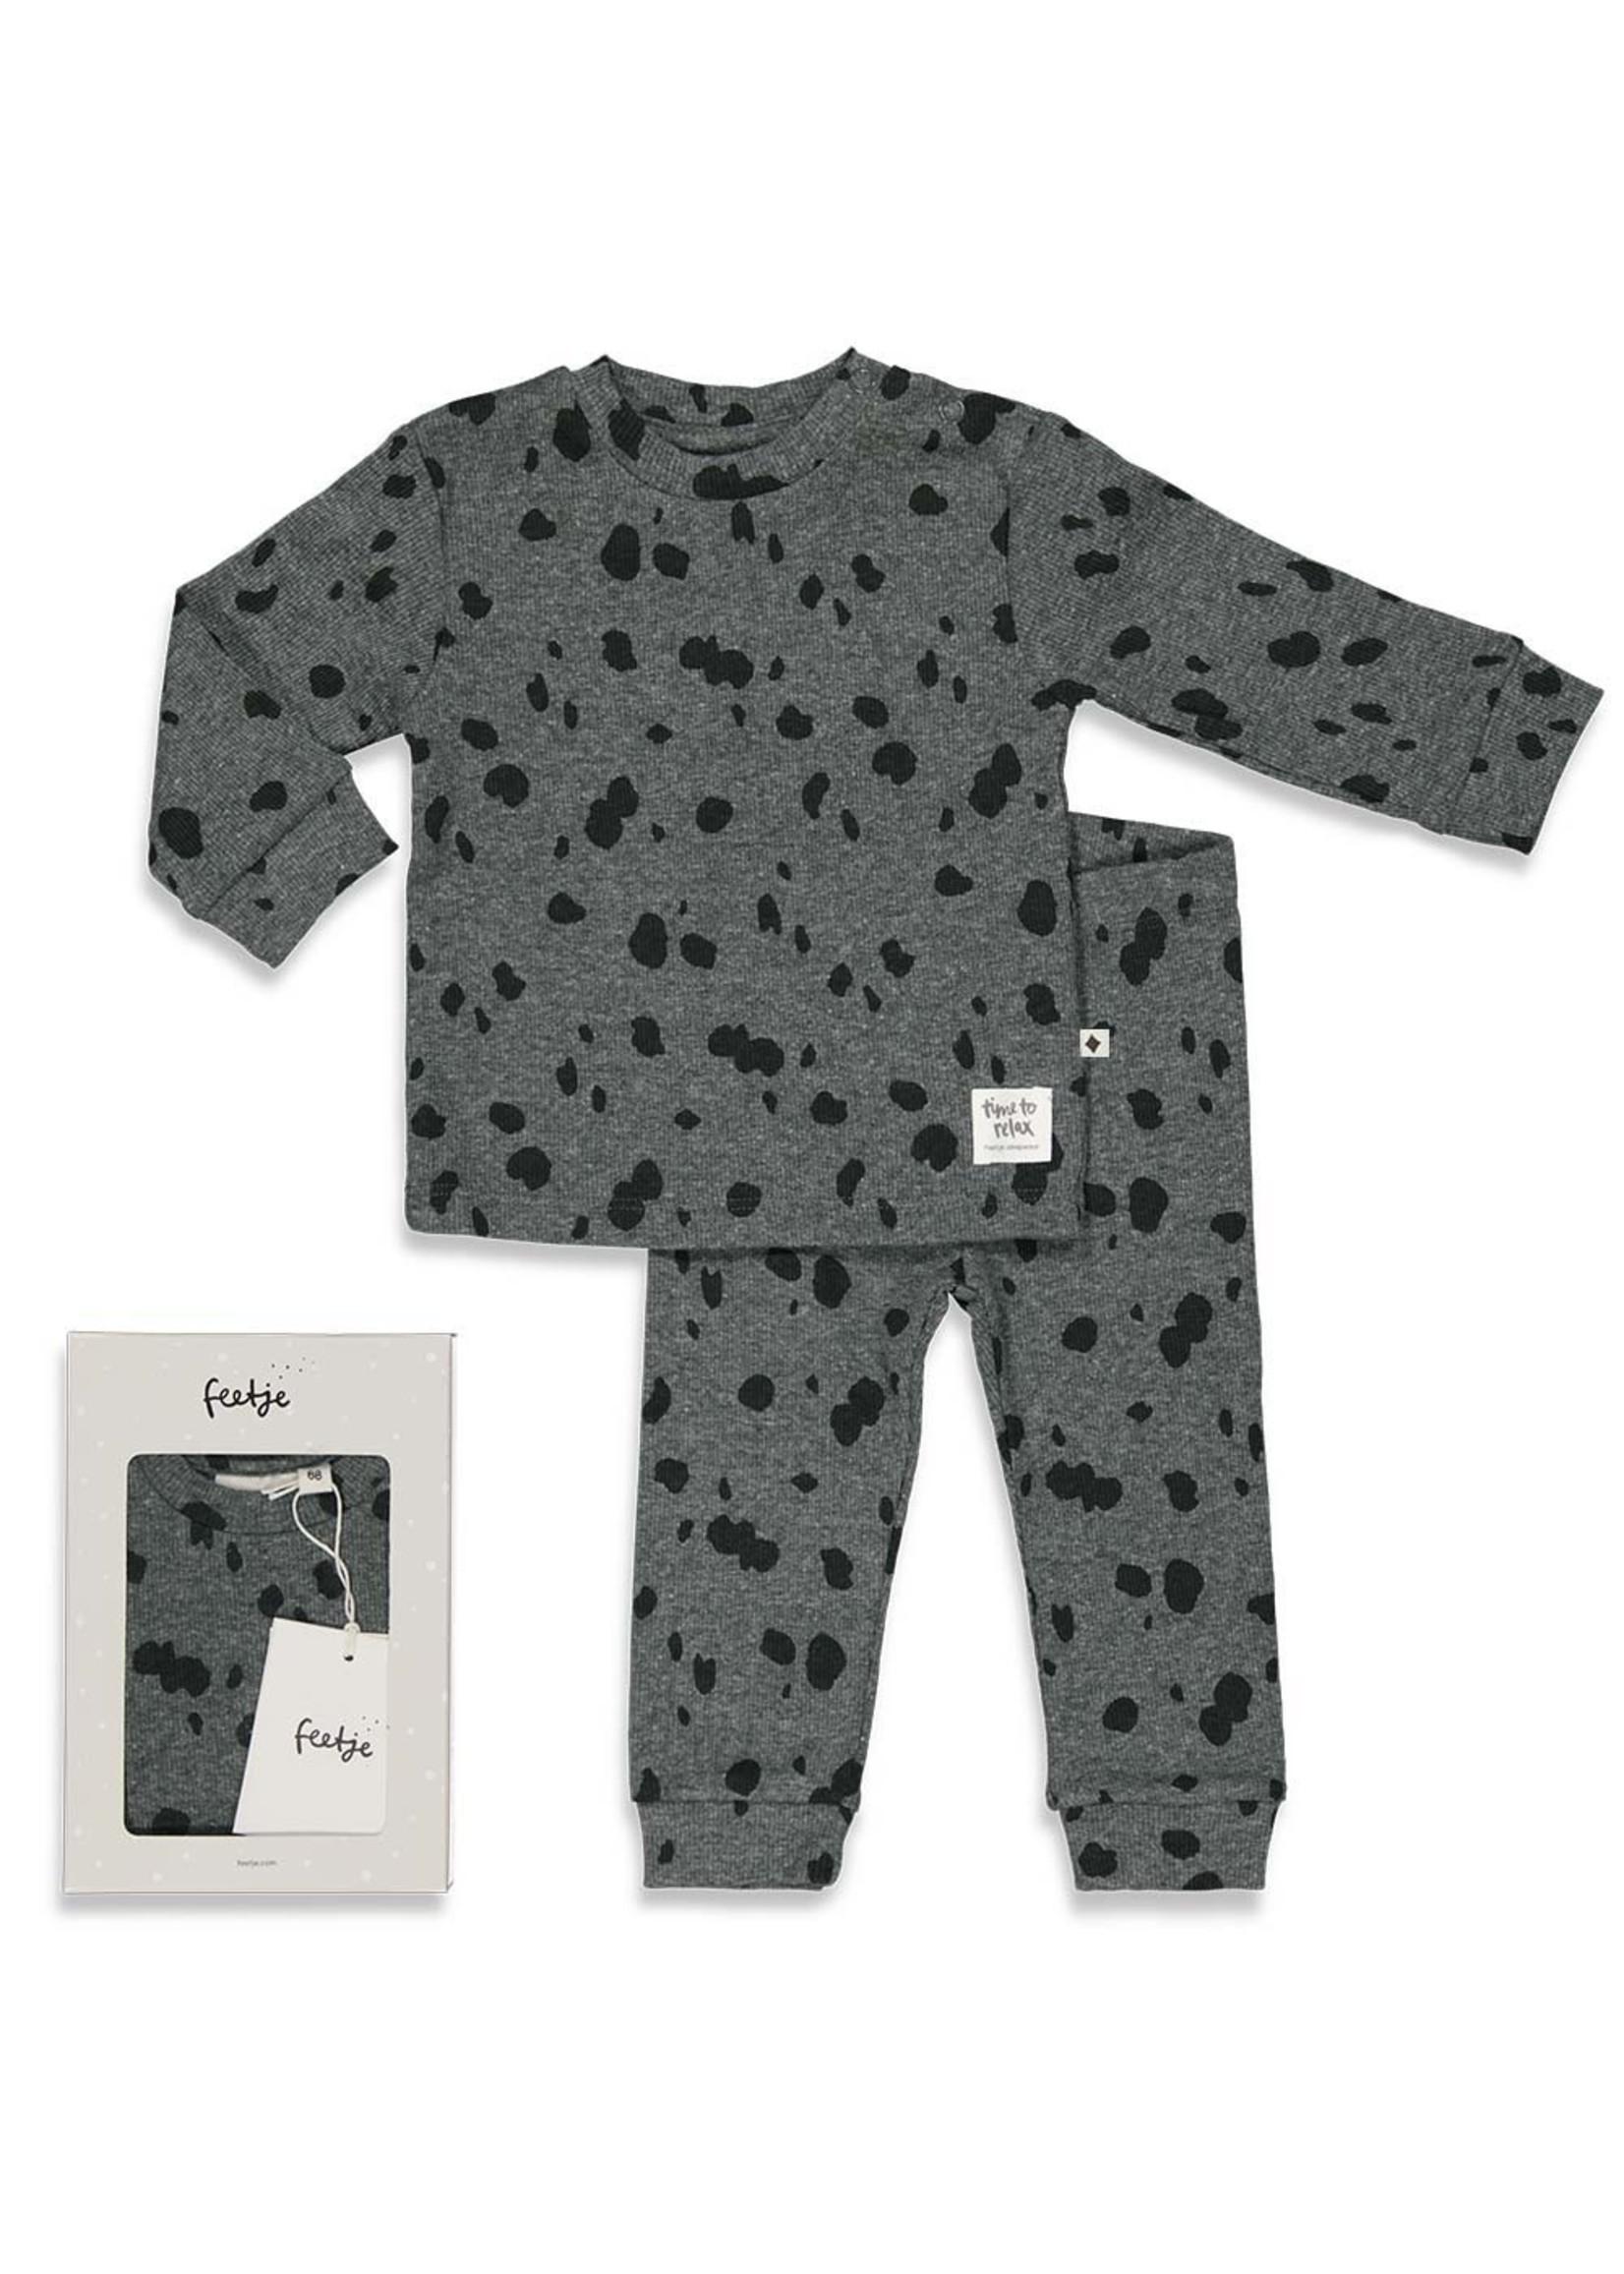 Feetje Spotted Sam - Premium Sleepwear